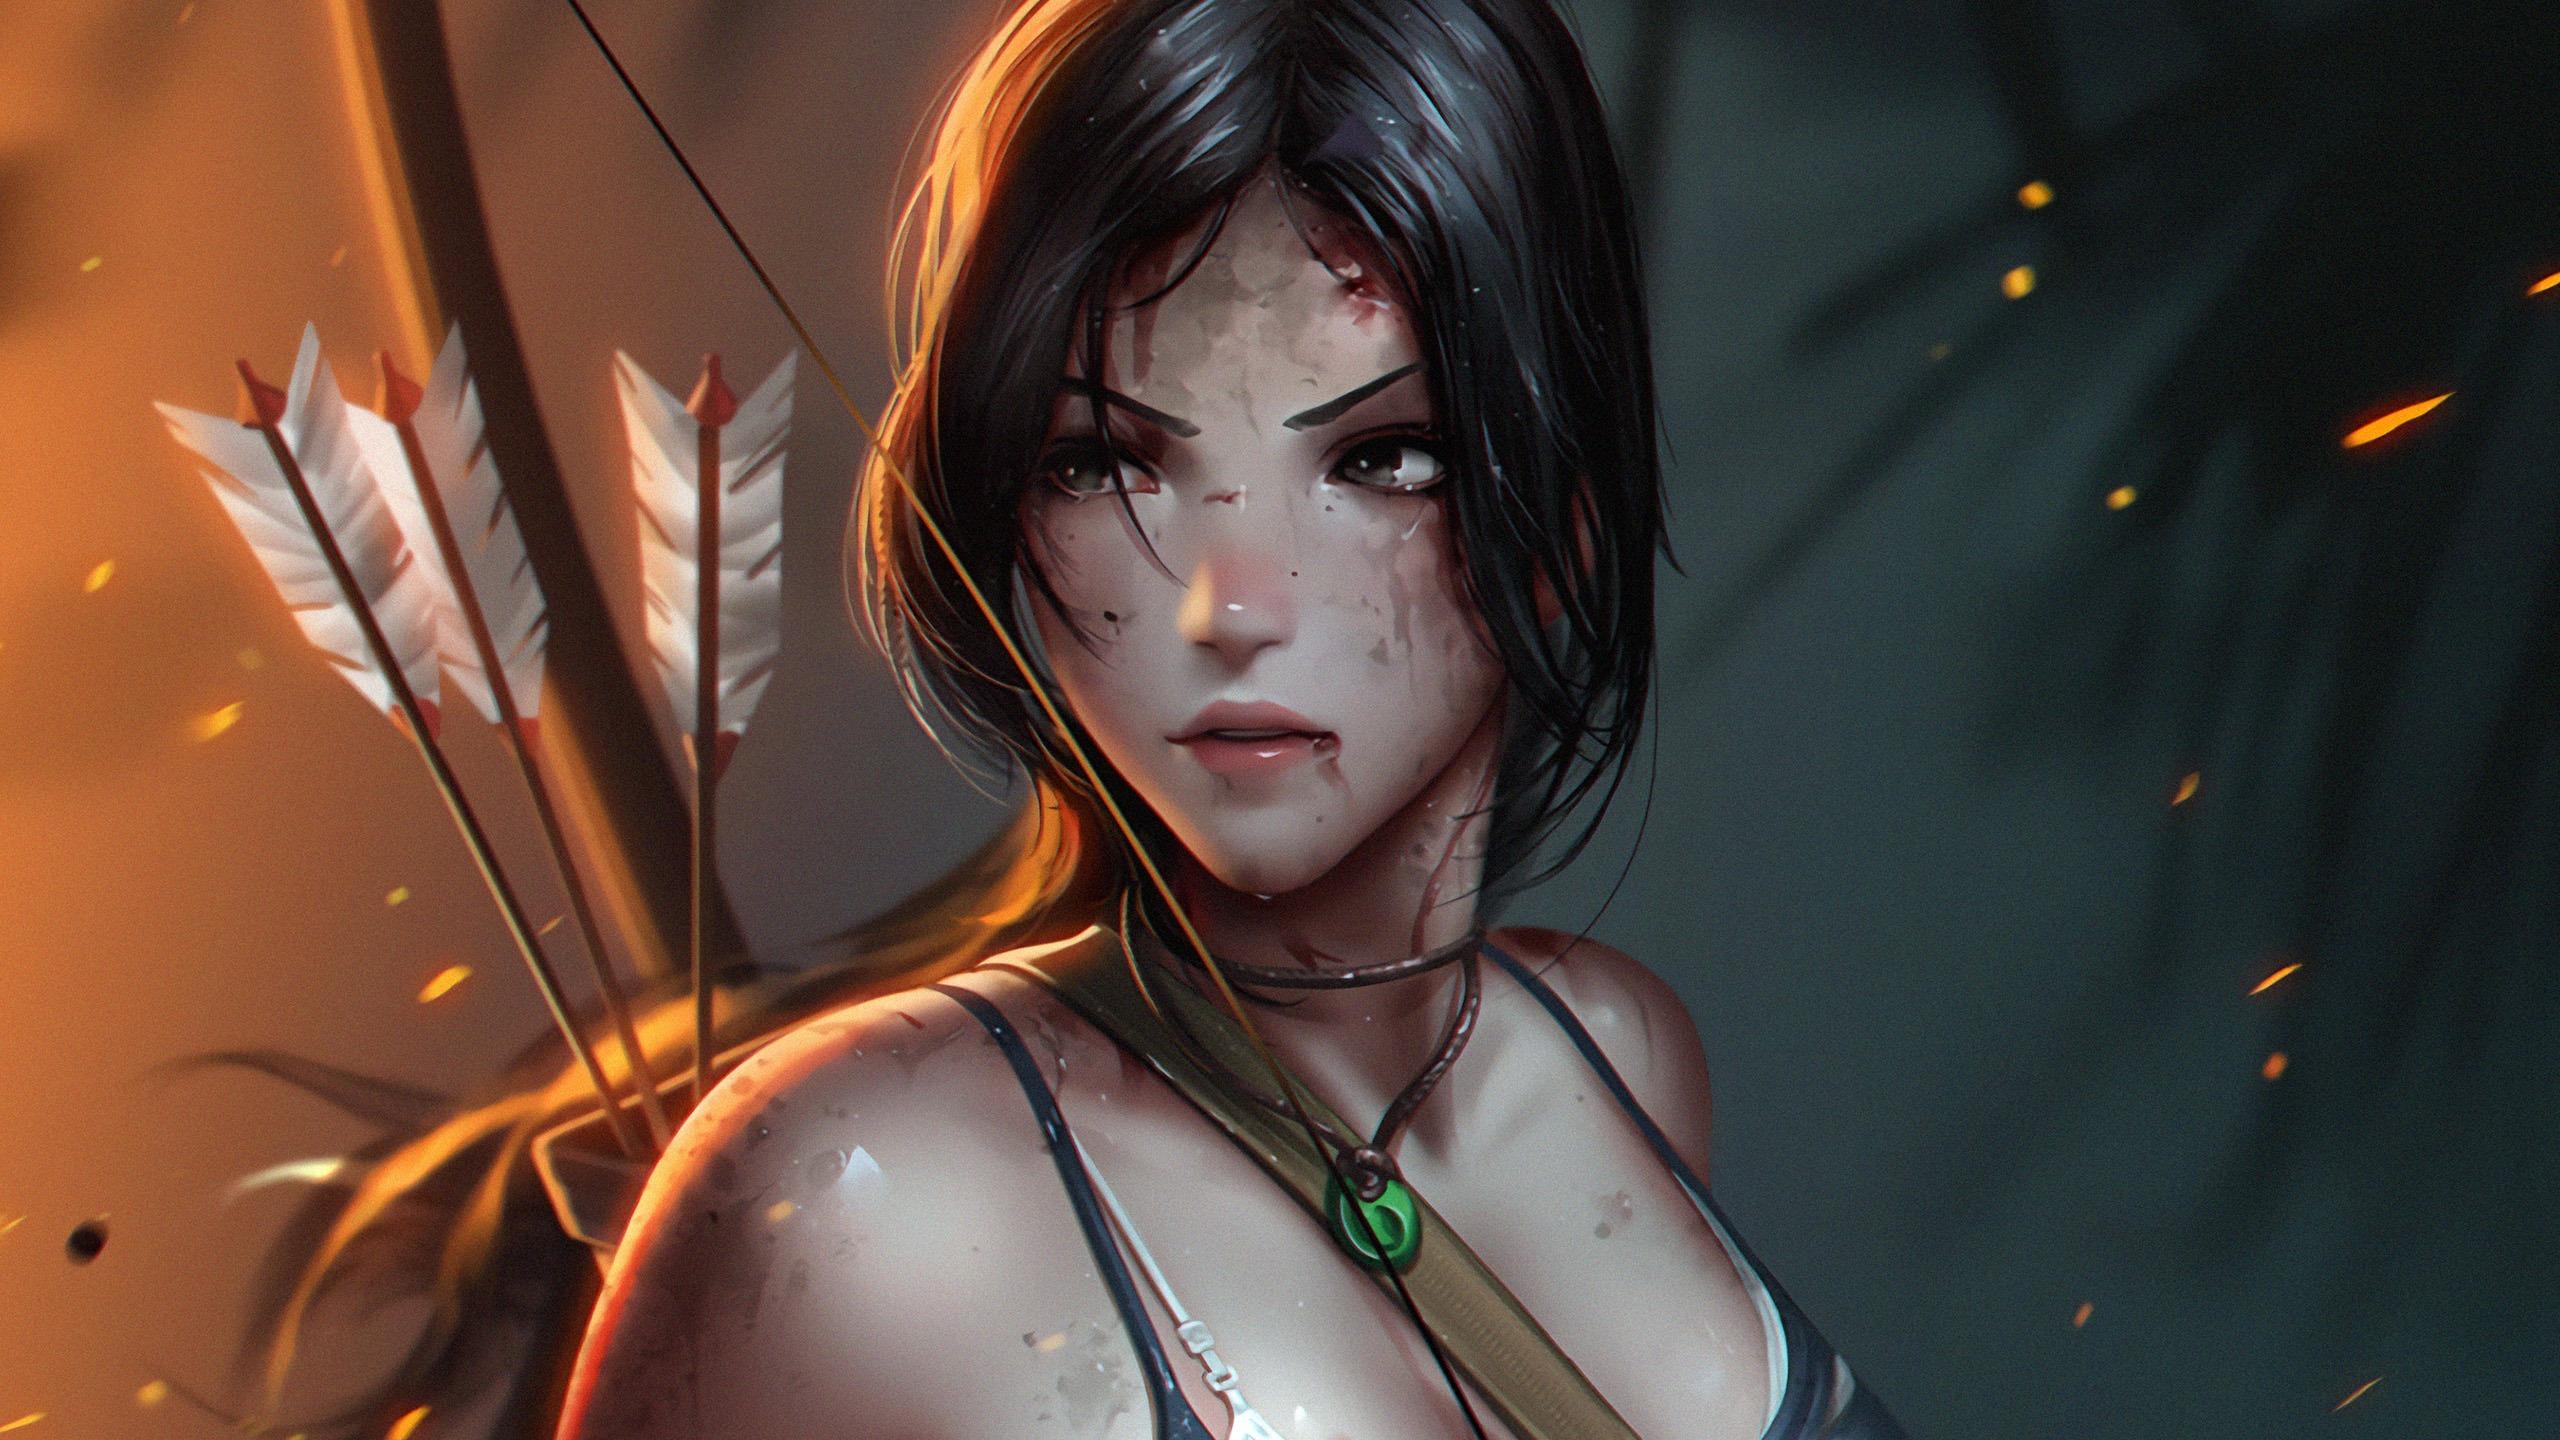 Lara Croft Tomb Raider 2019 Anime Character Preview 10wallpaper Com